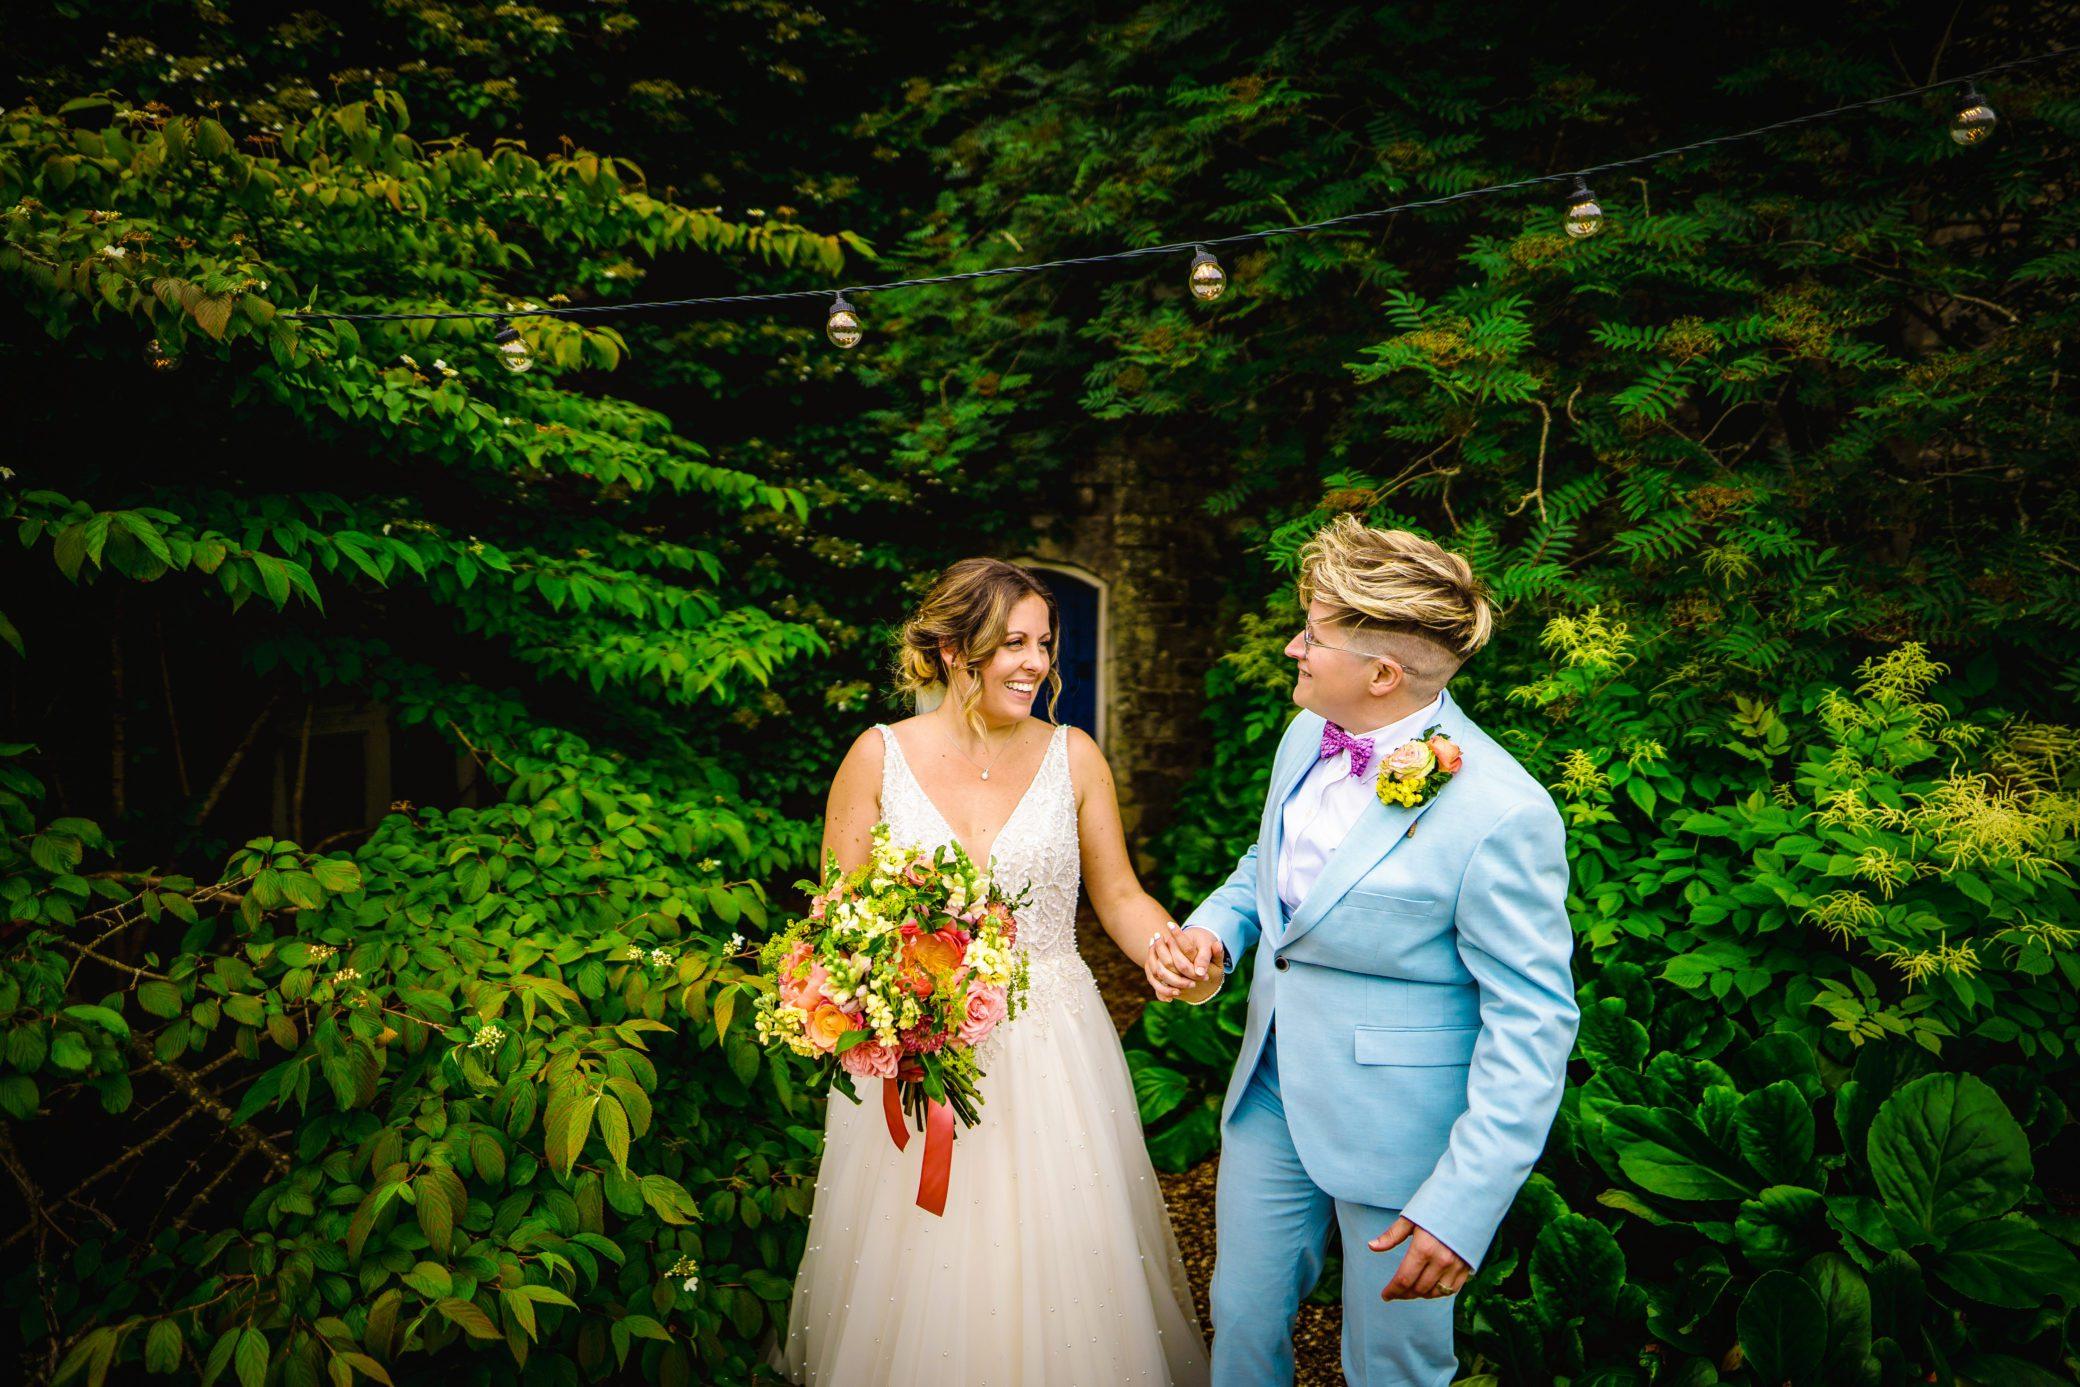 Beautiful wedding photography in Surrey